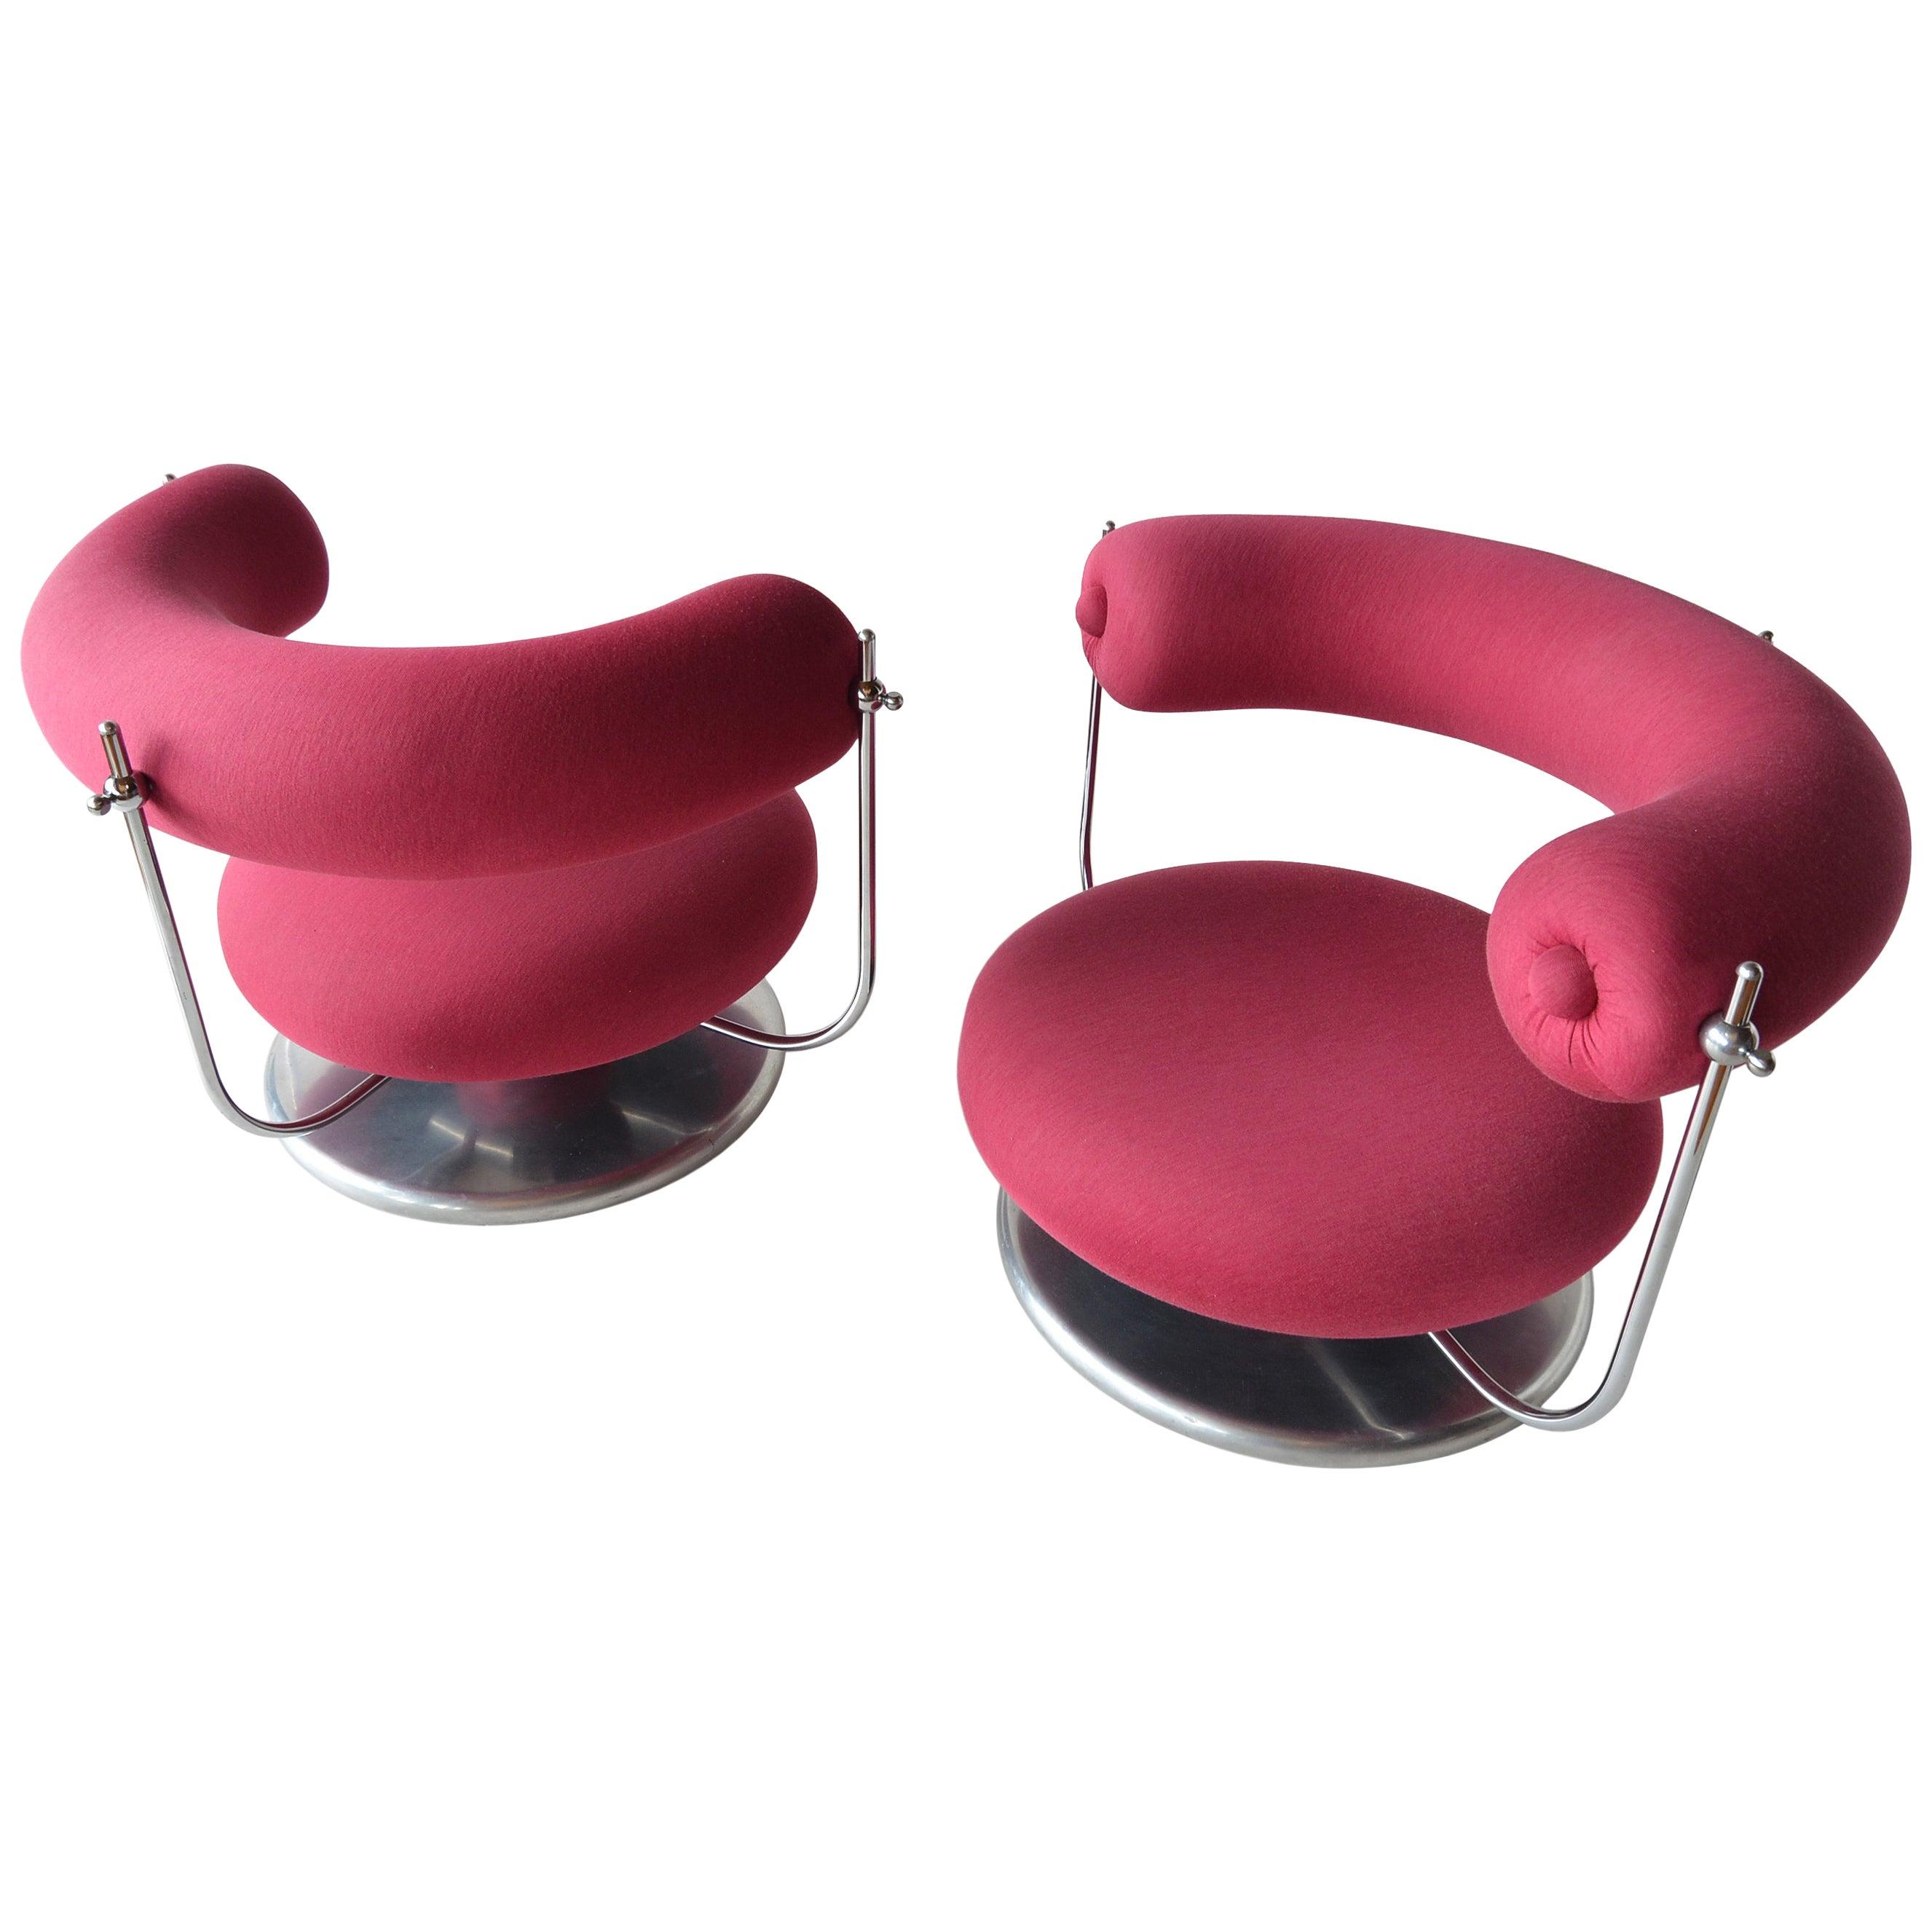 Verner Panton S401 Lounge Chairs